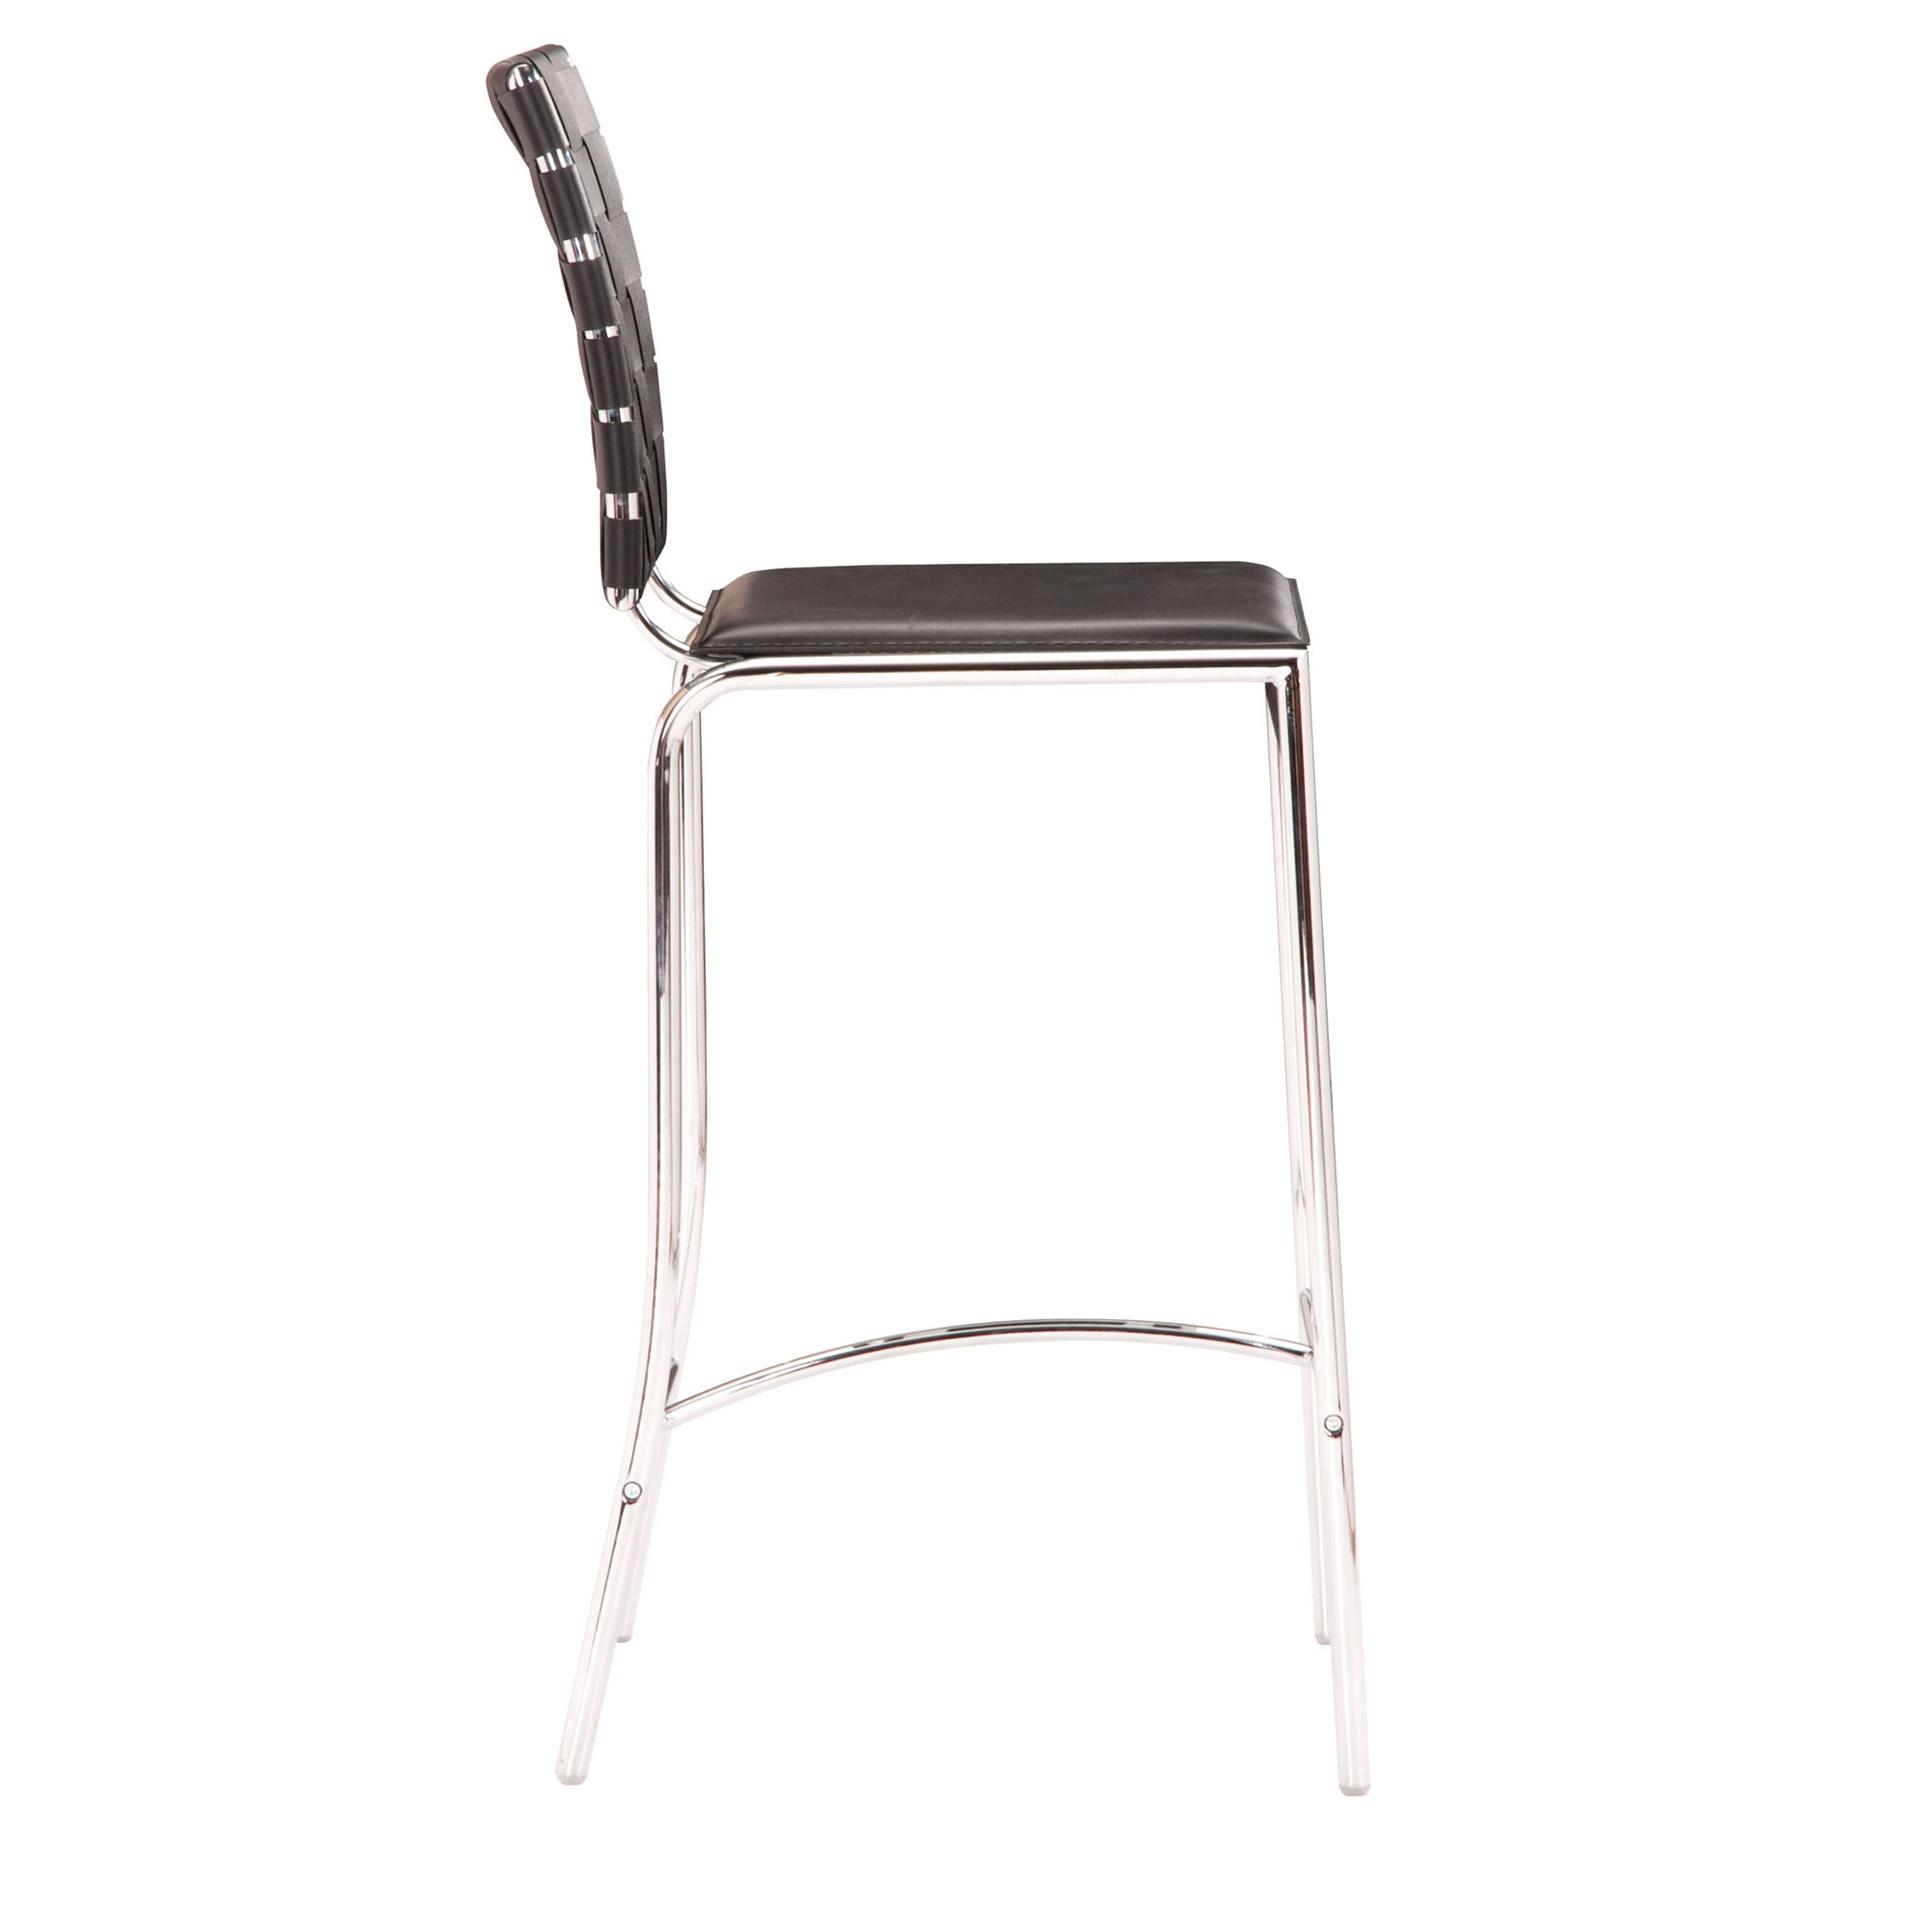 Strange Criss Cross Counter Stool Lamtechconsult Wood Chair Design Ideas Lamtechconsultcom